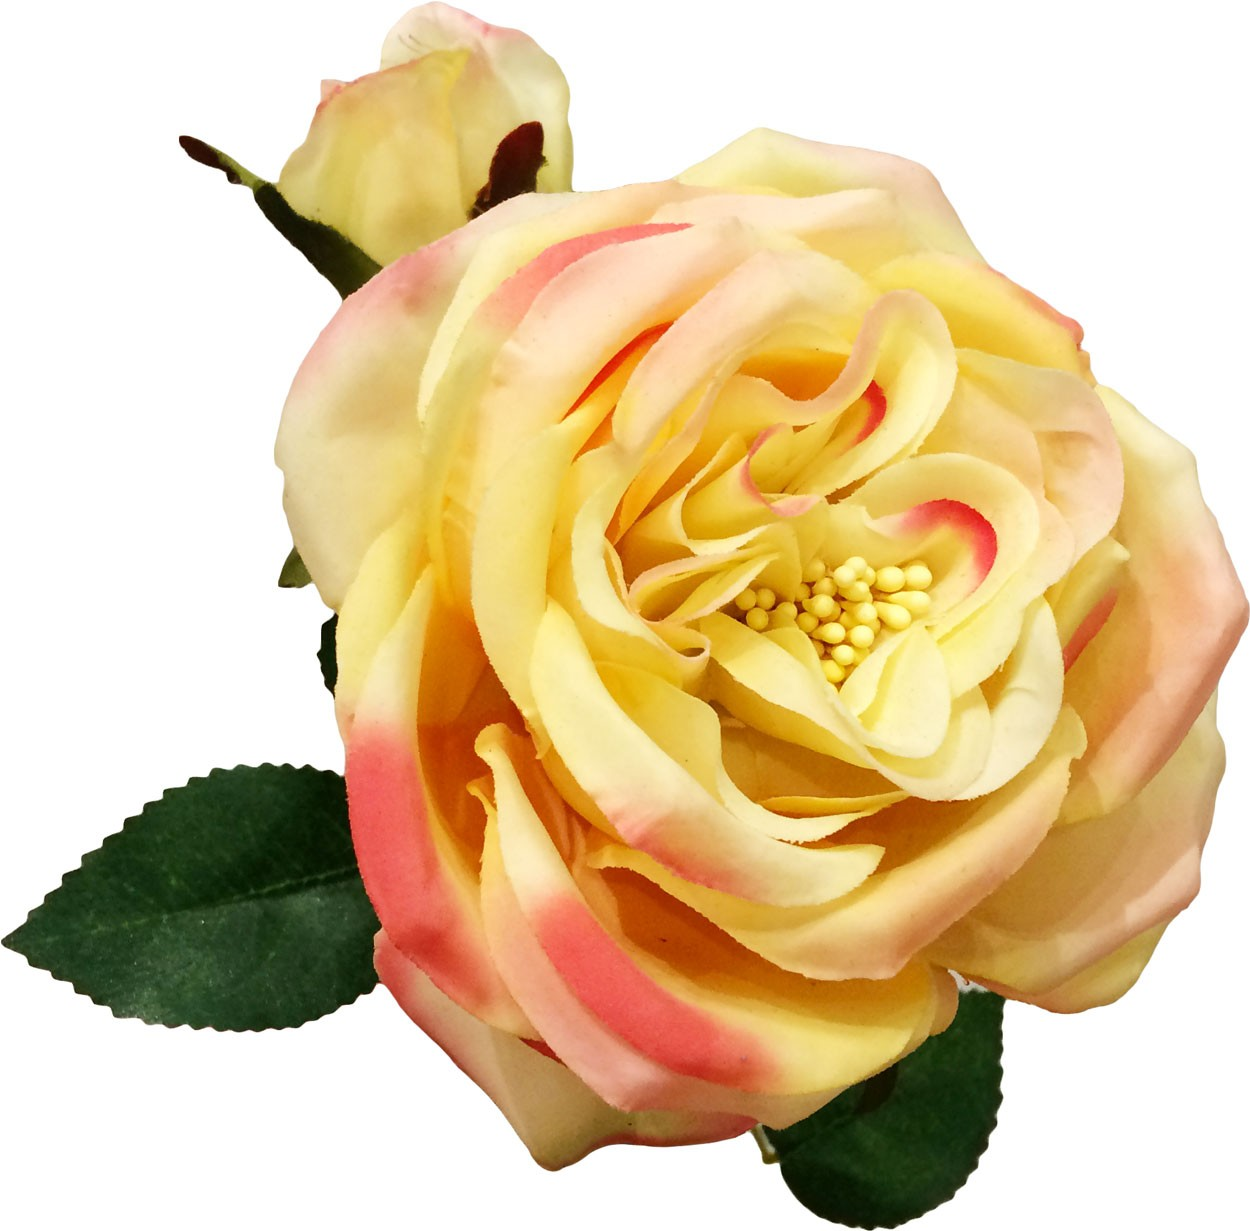 Fiori Giallo Ocra.Rosa Artificiale Giallo Ocra H60 Cm Bekreative